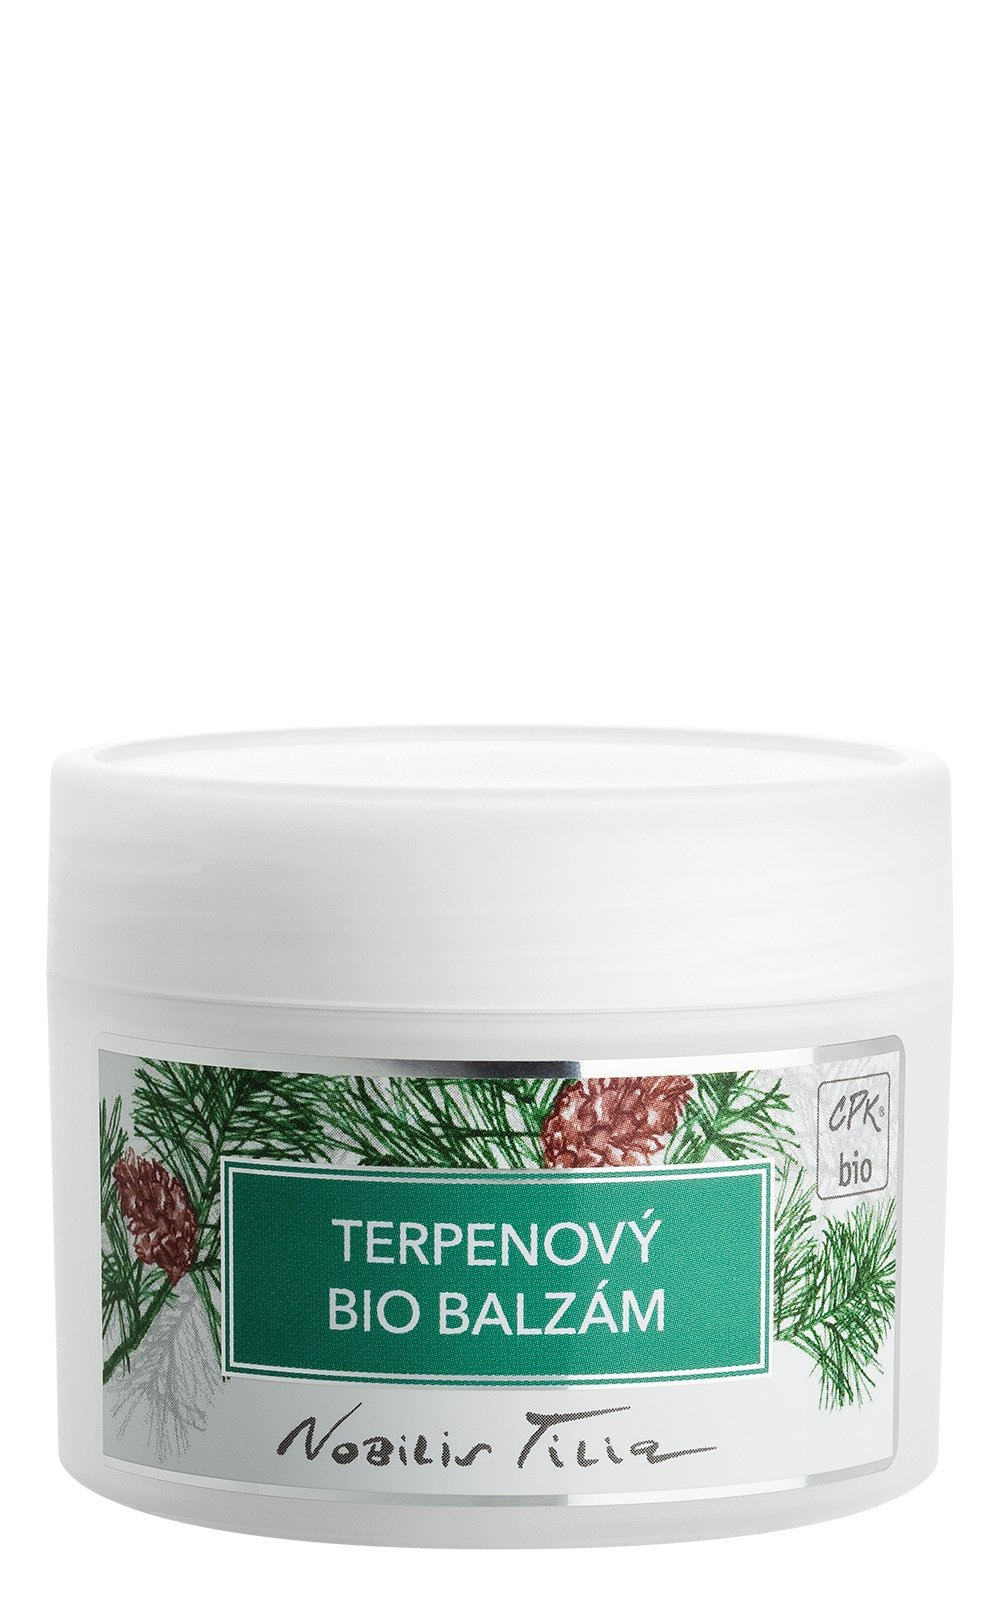 Terpenový bio balzám: 50 ml